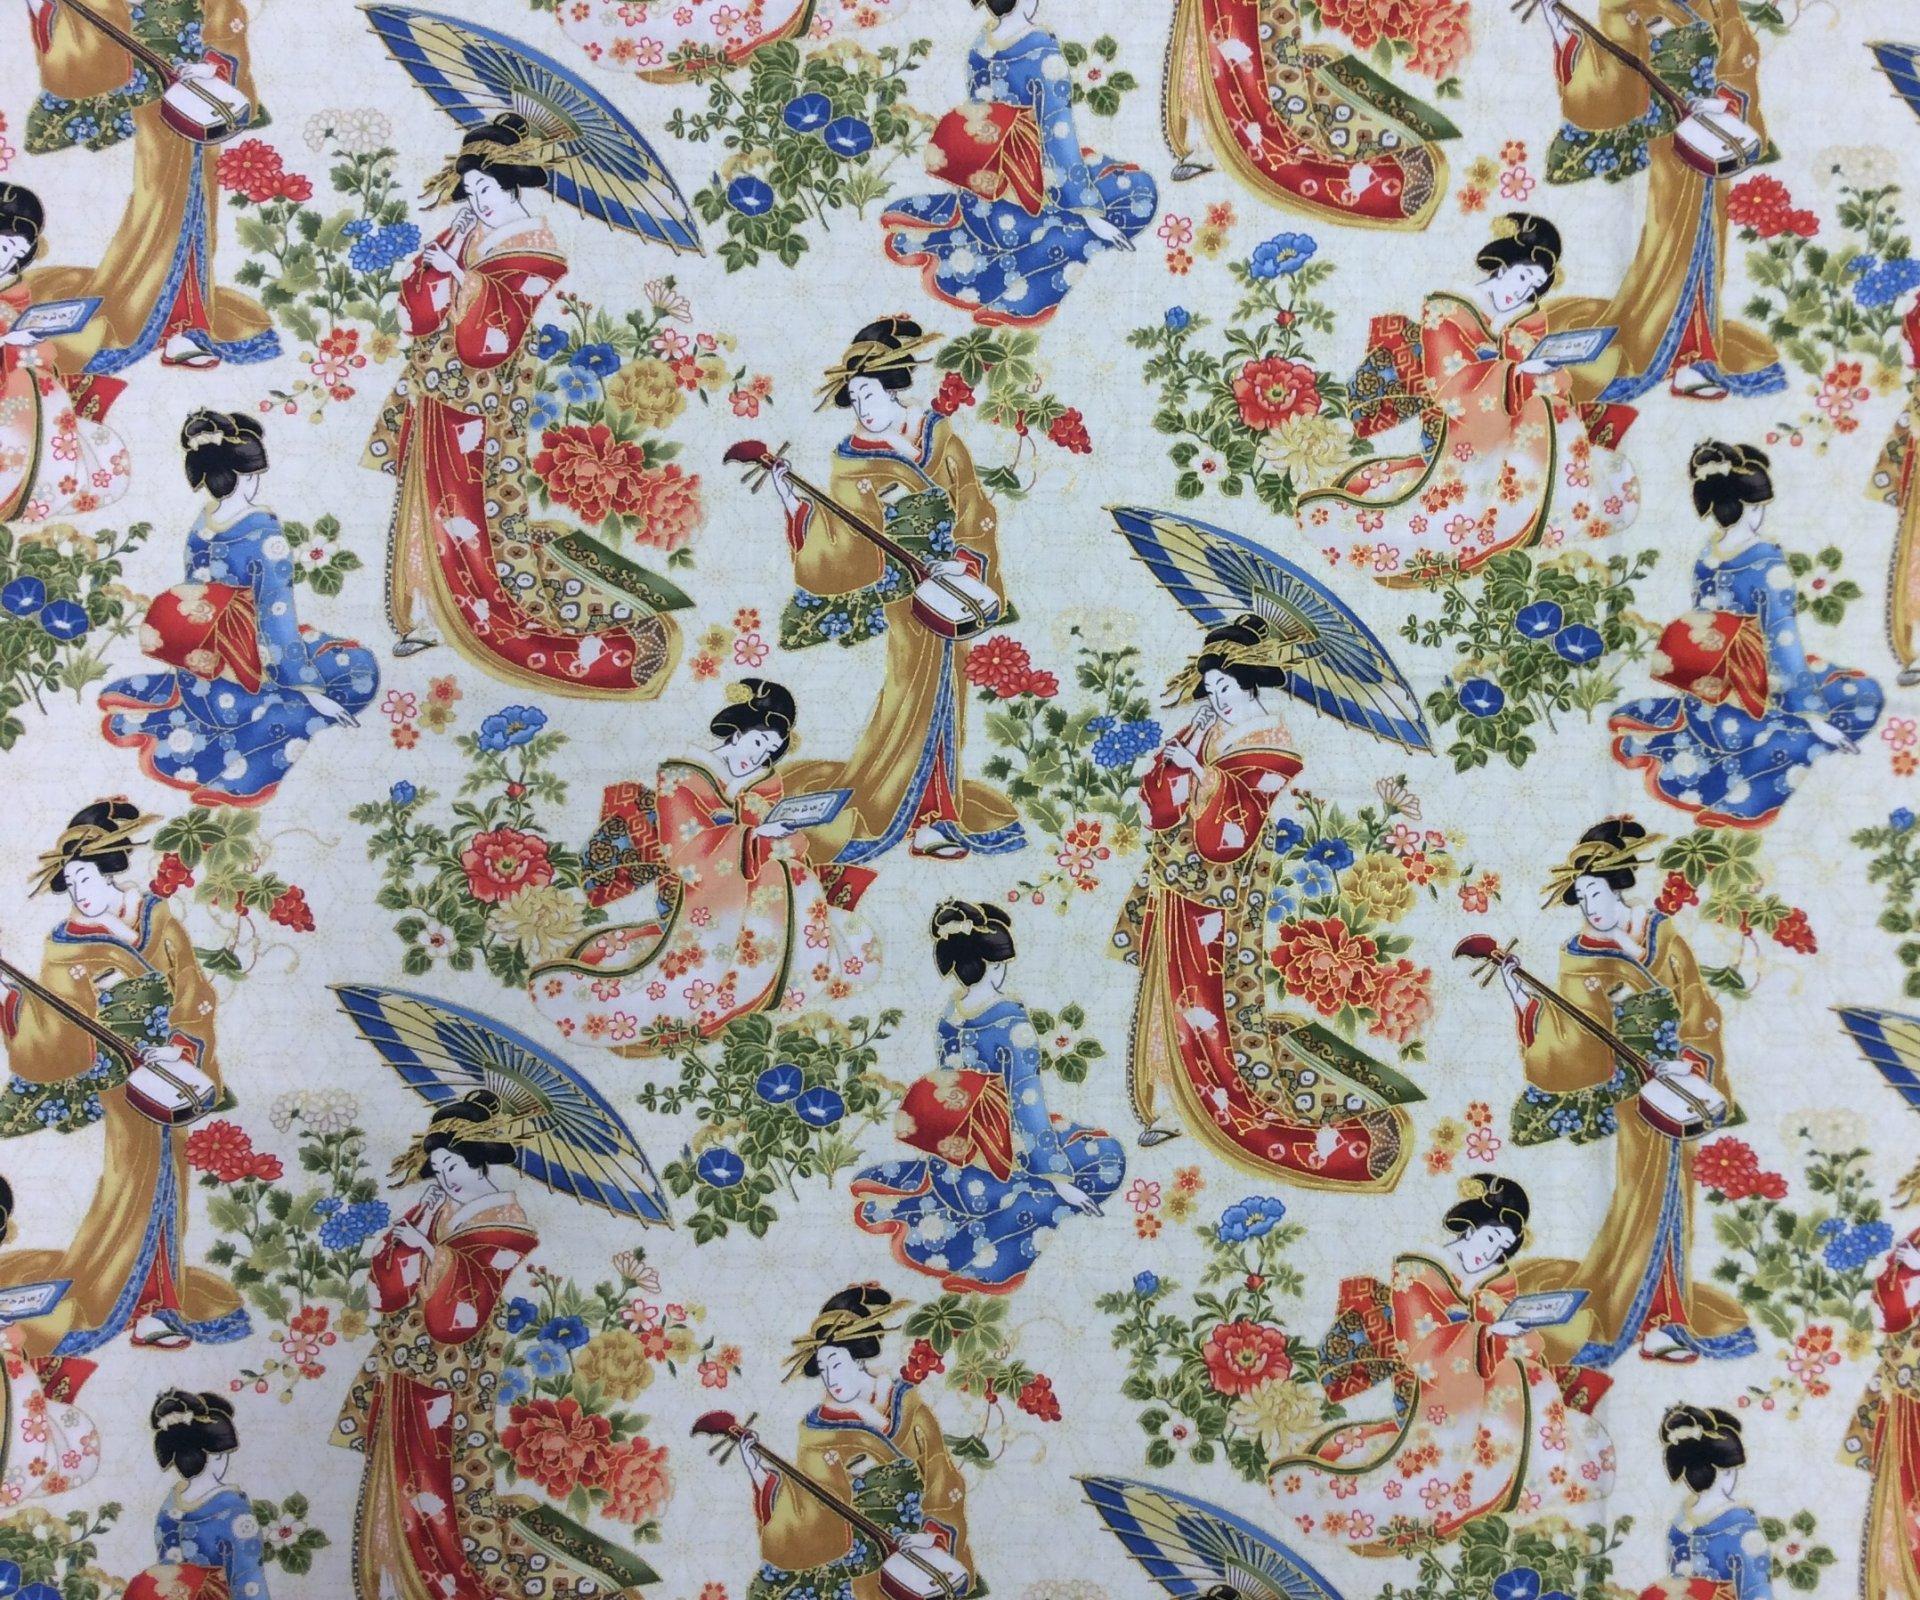 Japanese Geisha Garden Kimono Fan Asia Japan Cotton Fabric Quilting Fabric NC26